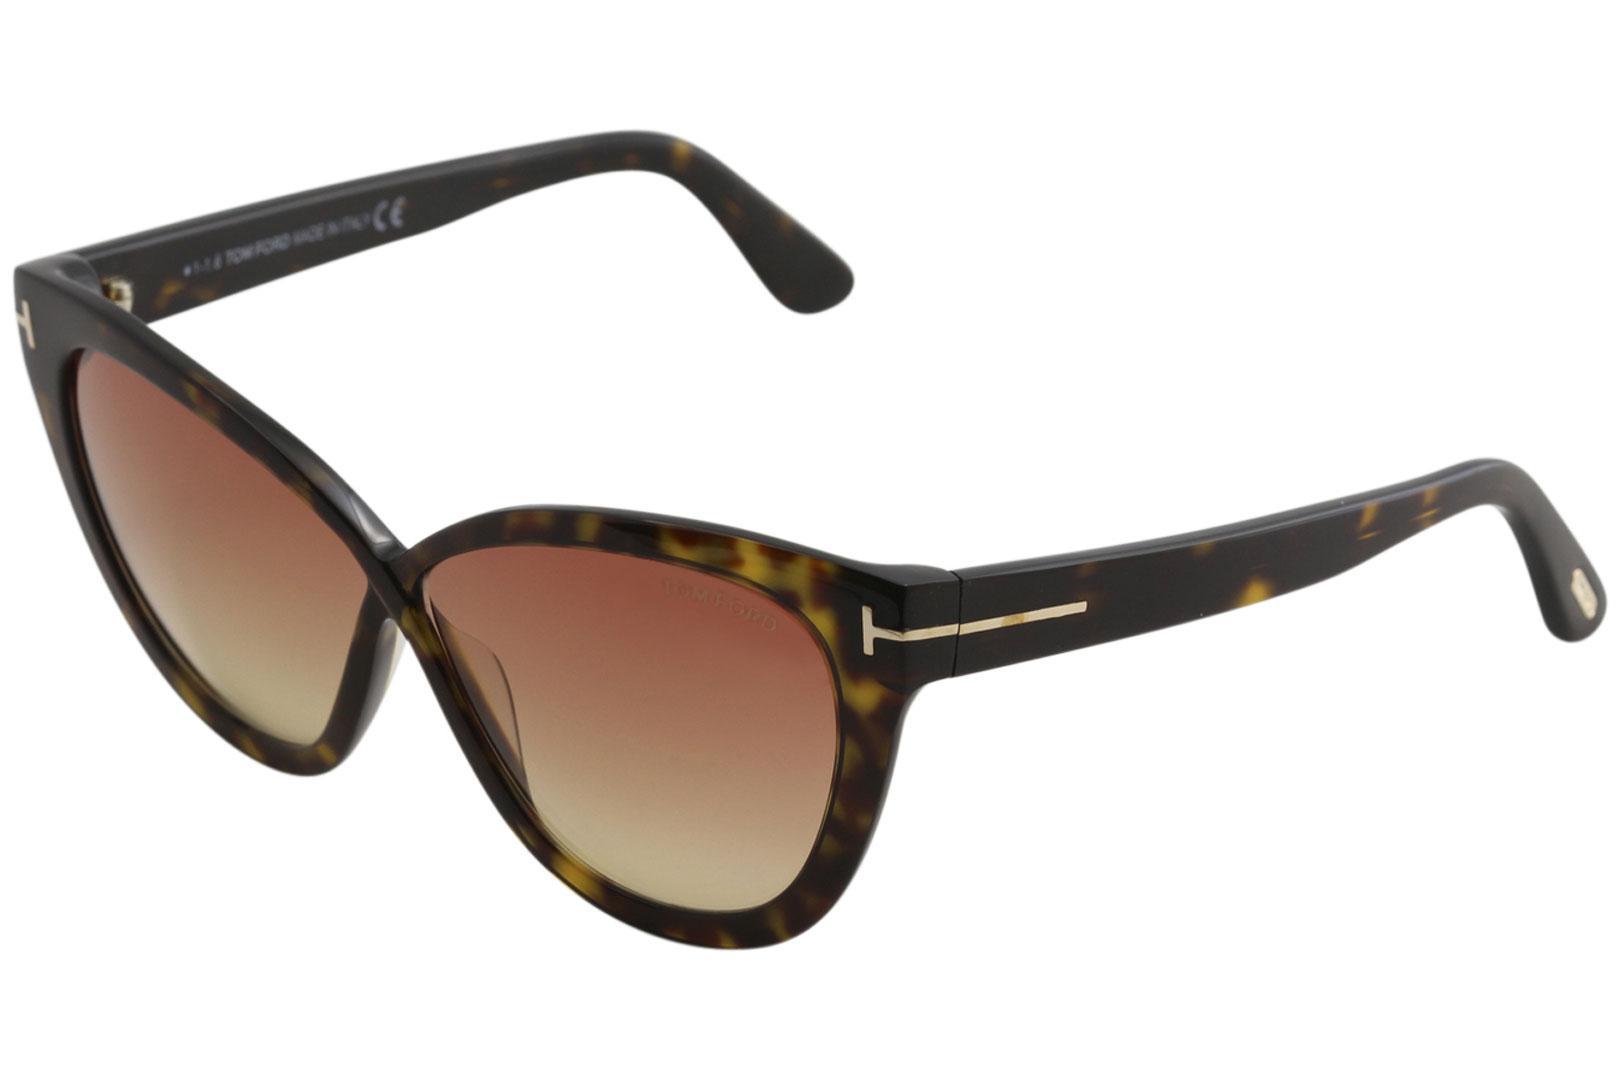 4c3dc2150b8 Tom Ford Women s Arabella TF511 TF 511 Fashion Cat Eye Sunglasses